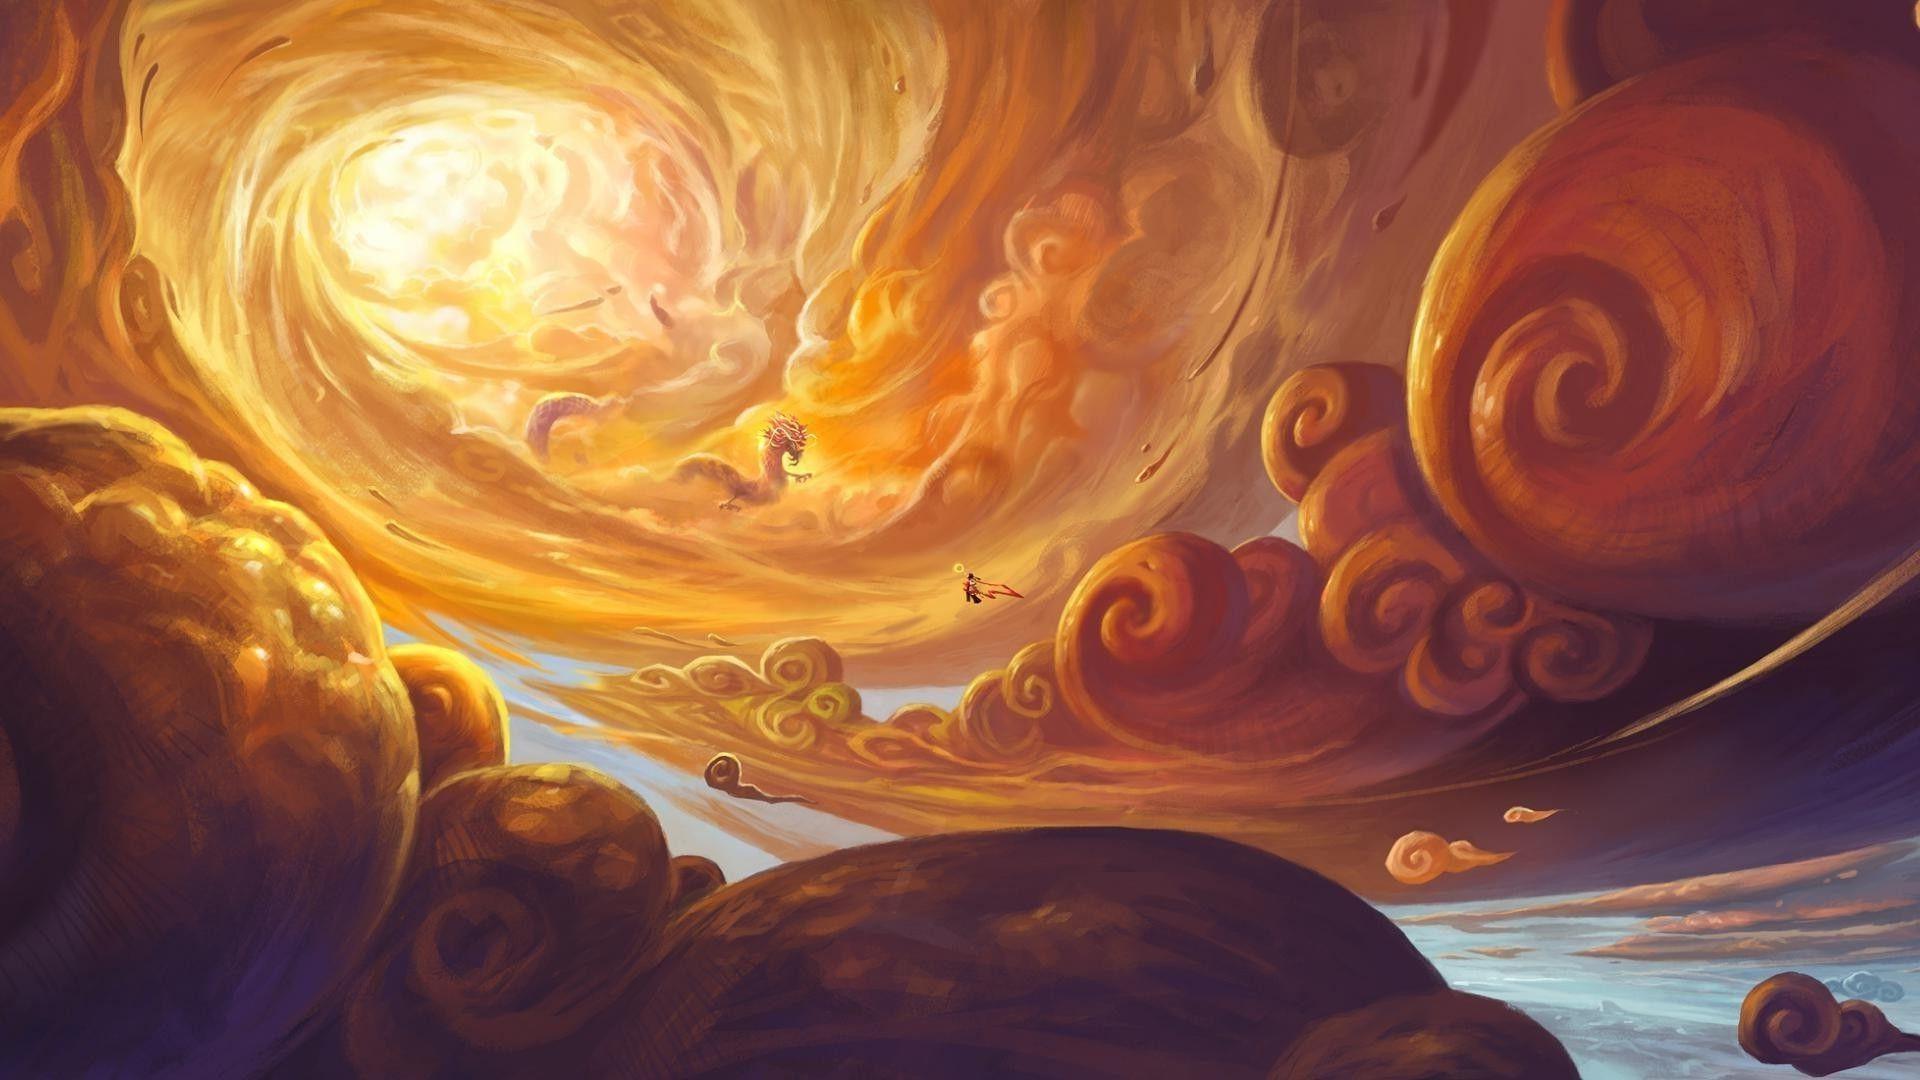 Cloud Dragon Wallpapers Top Free Cloud Dragon Backgrounds